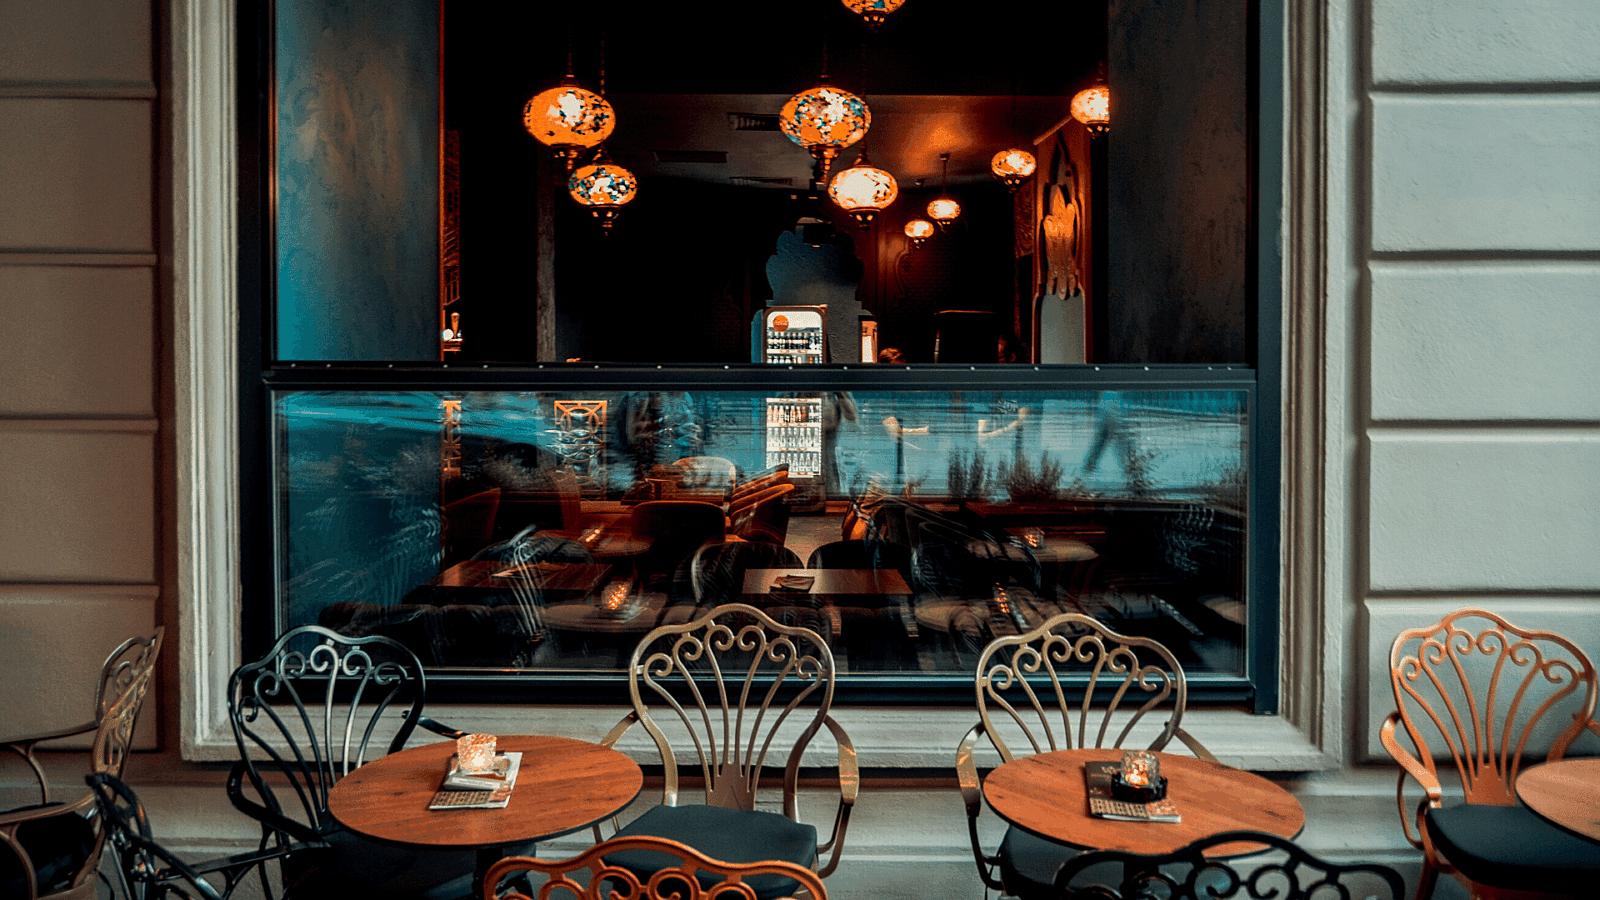 Restaurant consumer trends